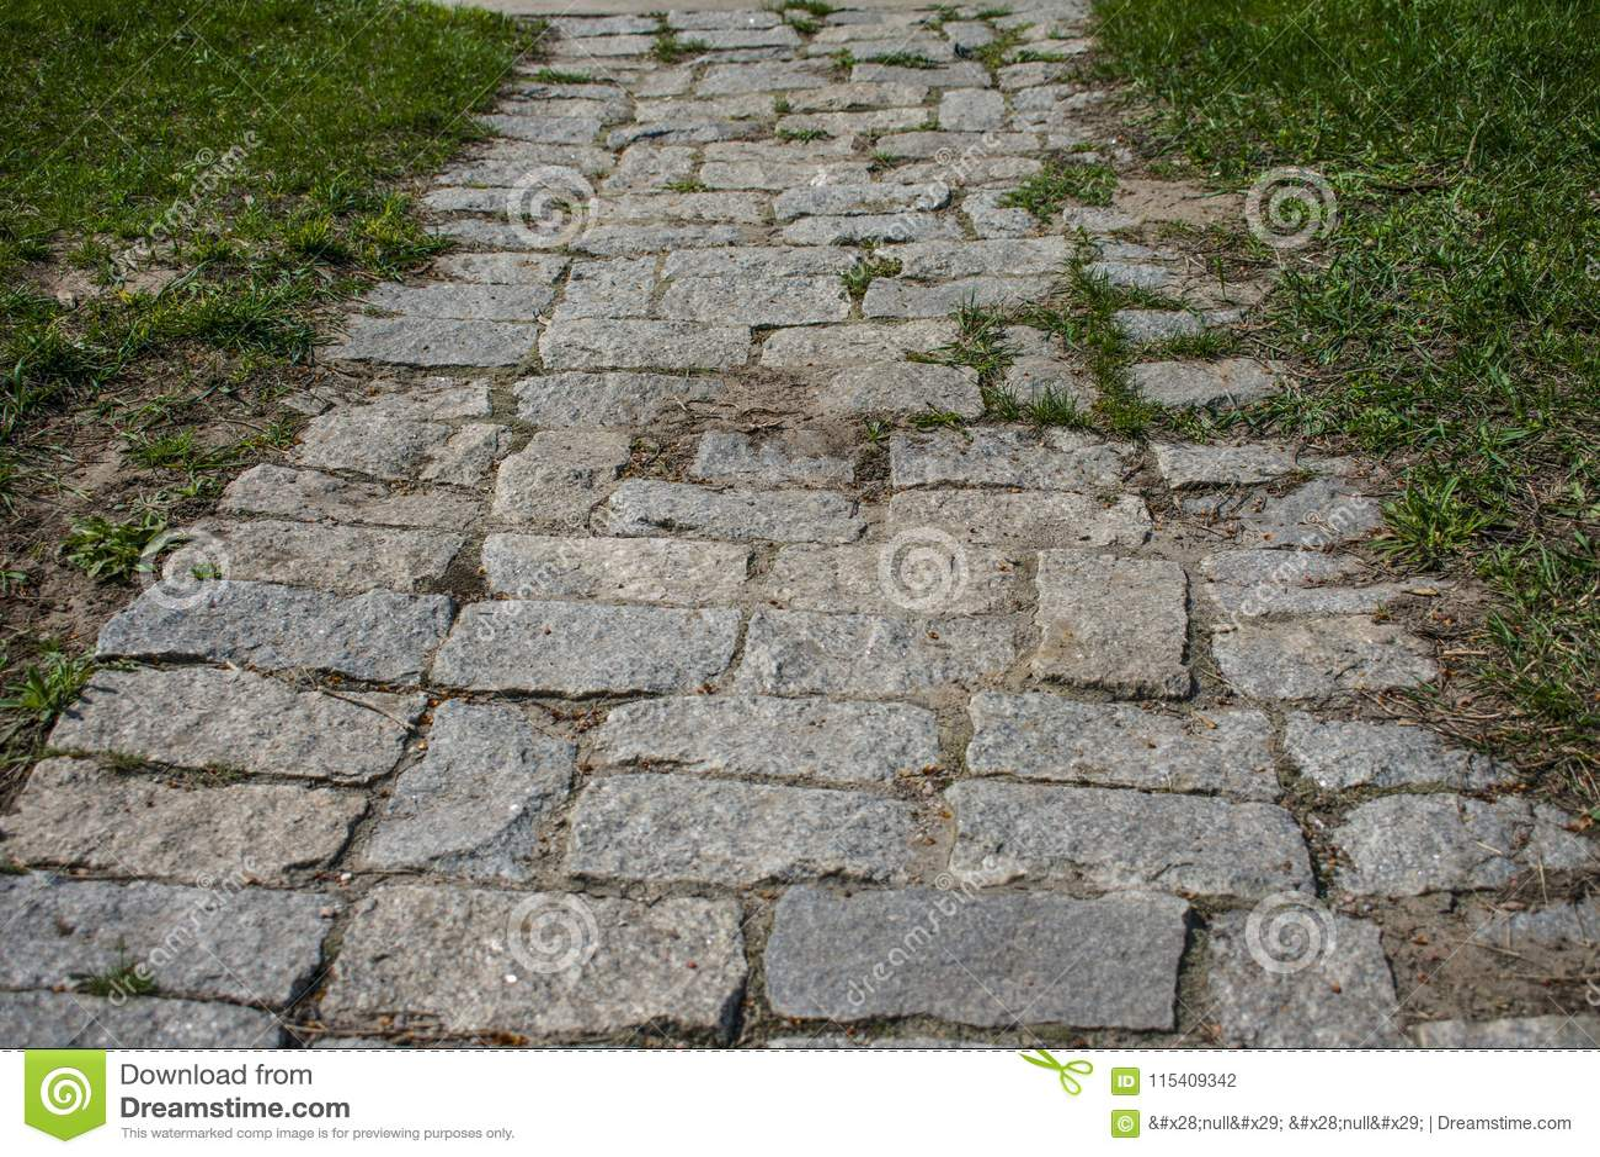 Old stone path on the island of Khortytsya